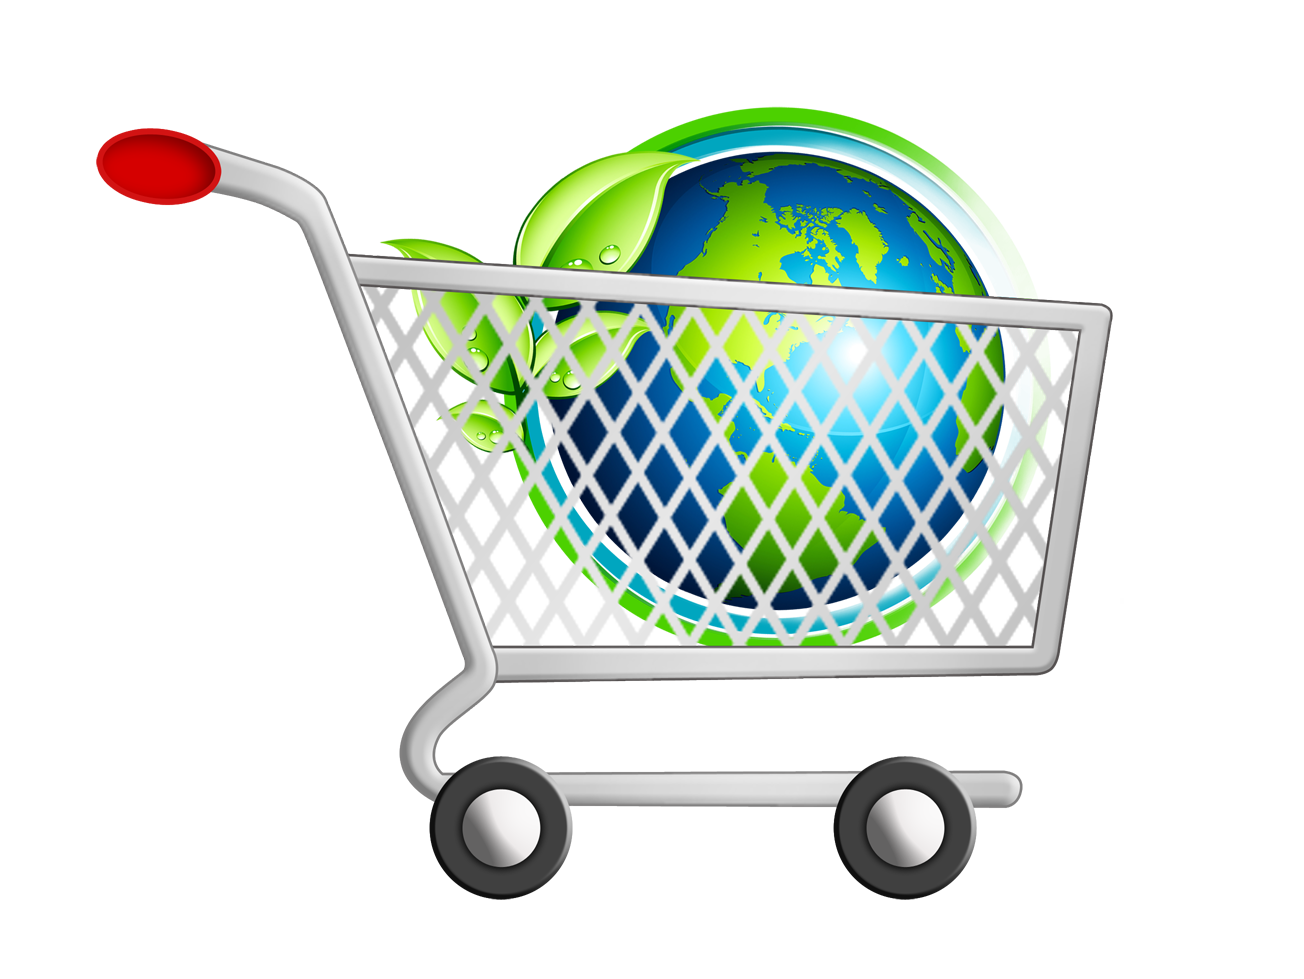 ventajas tienda online